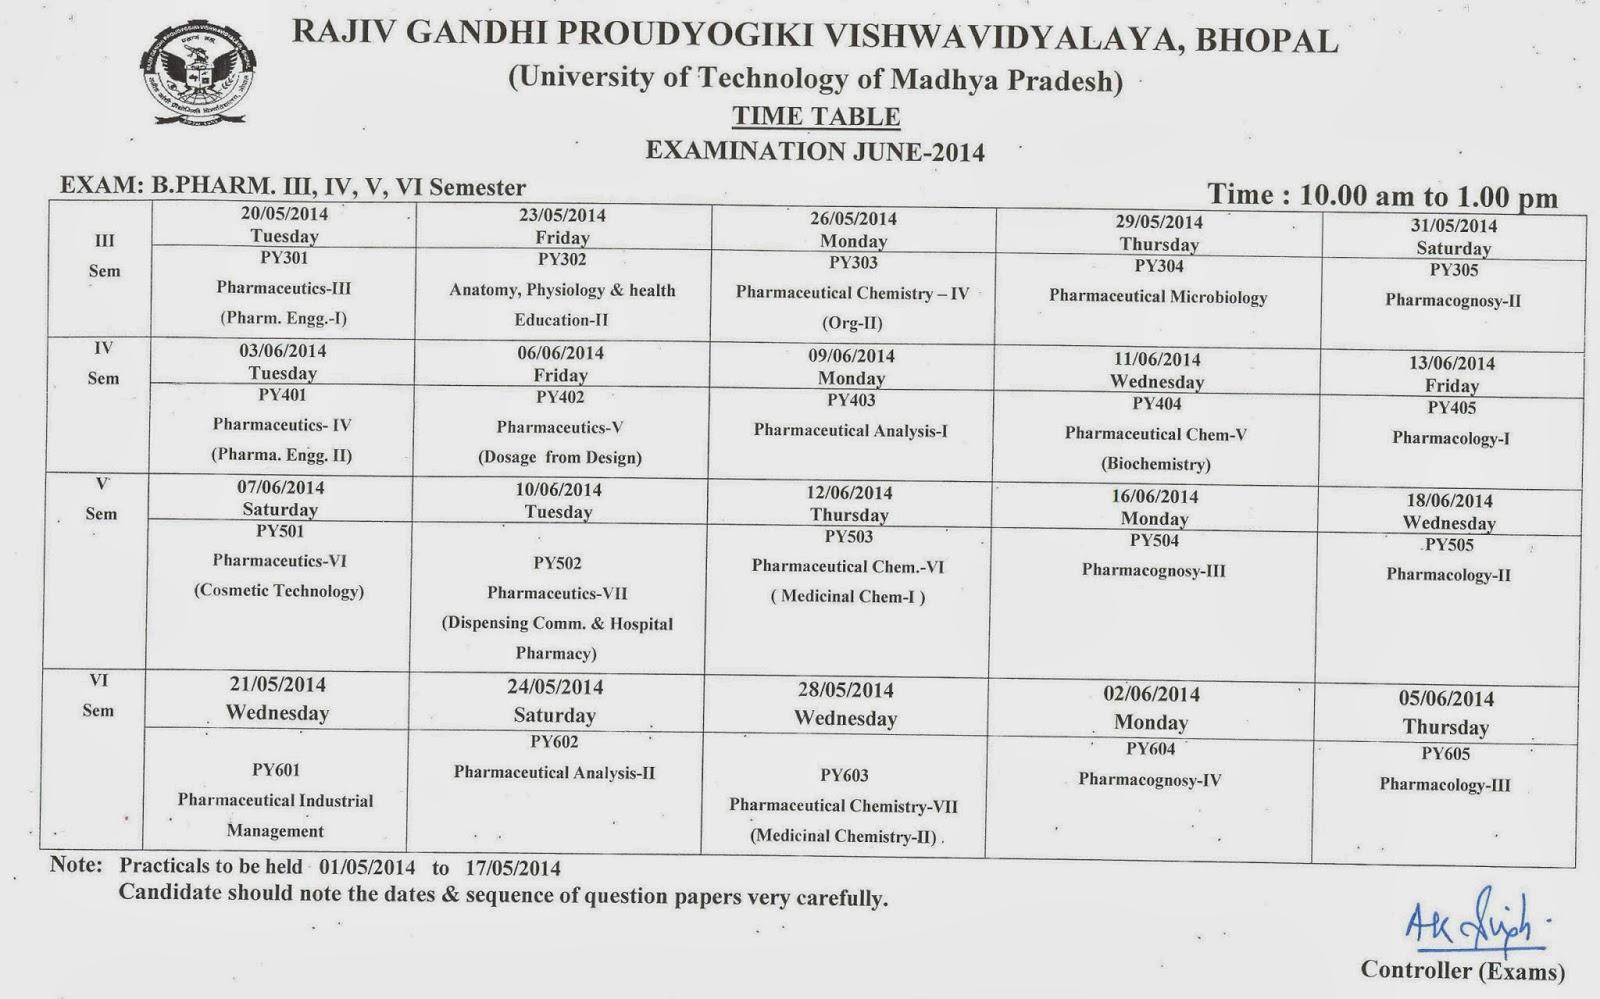 Rajiv Gandhi Proudyogiki Vishwavidyalaya: RGPV B.Pharmacy